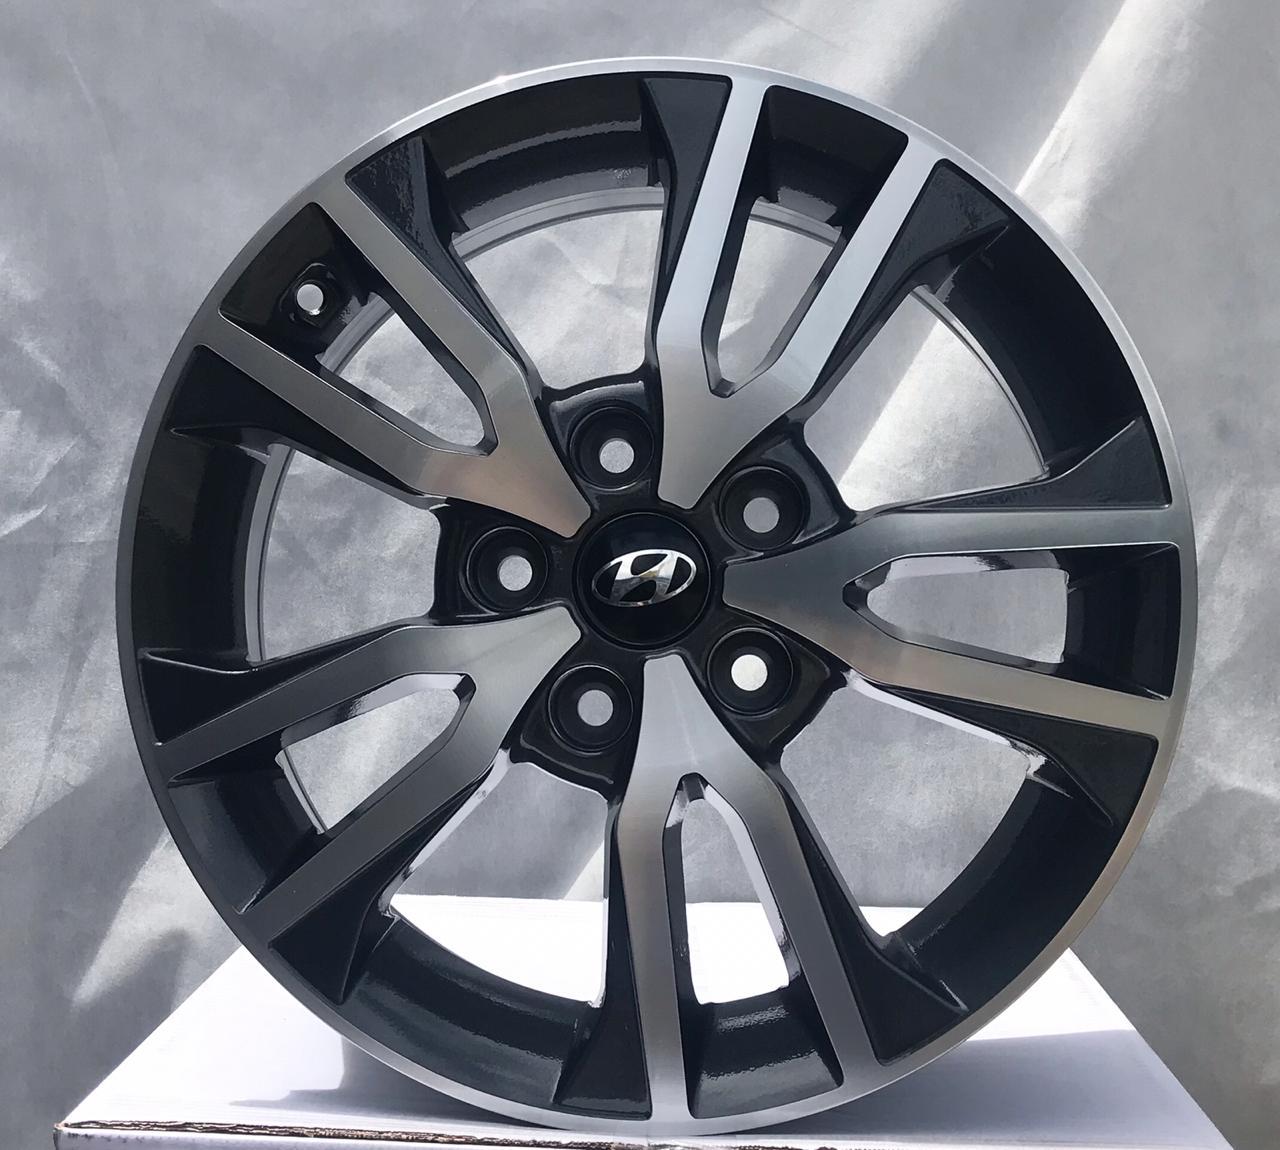 Kit 4 Rodas Aro 16X6 Creta Prestige  5X114,3 GD BRW 1360